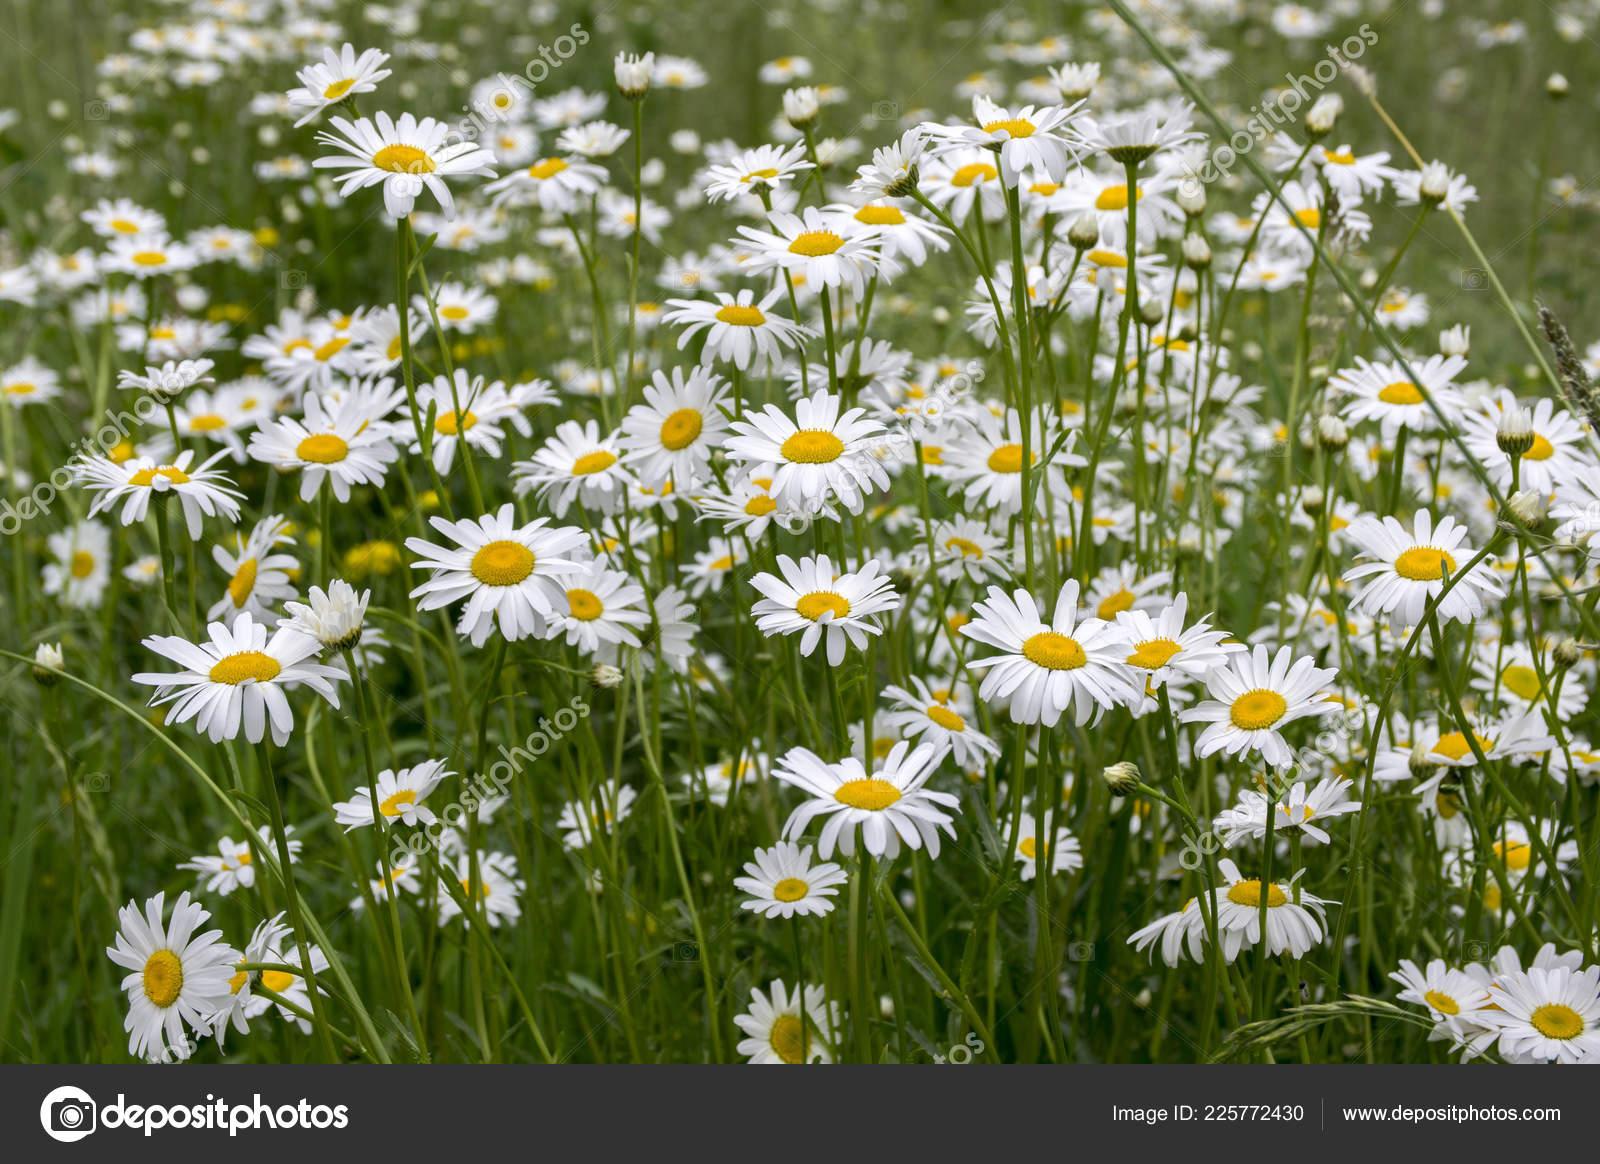 Leucanthemum Vulgare Meadows Wild Flowers White Petals Yellow Center